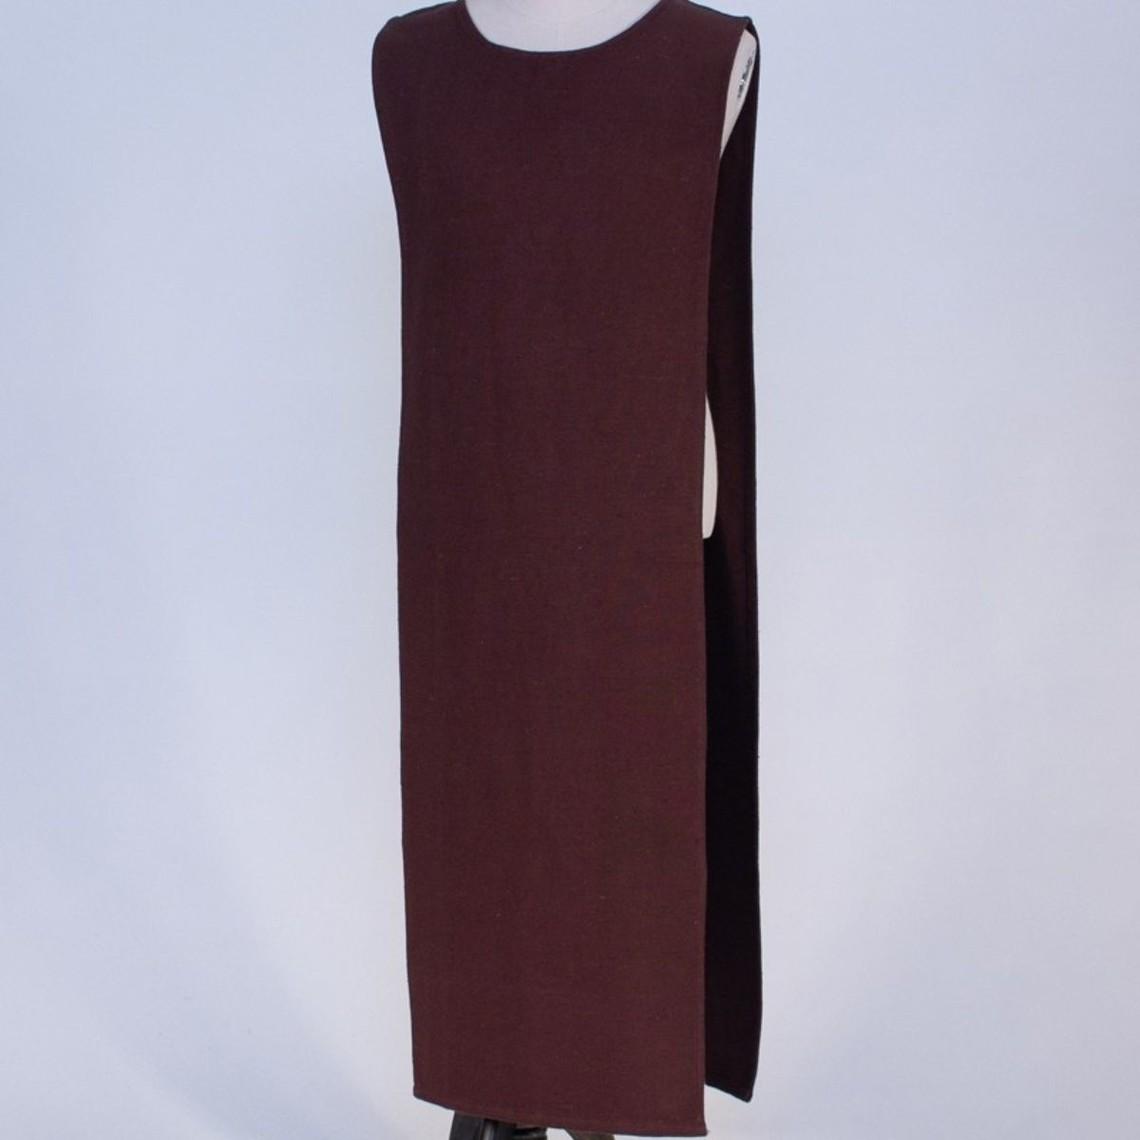 Burgschneider Tabard medievale / surcoat, marrone